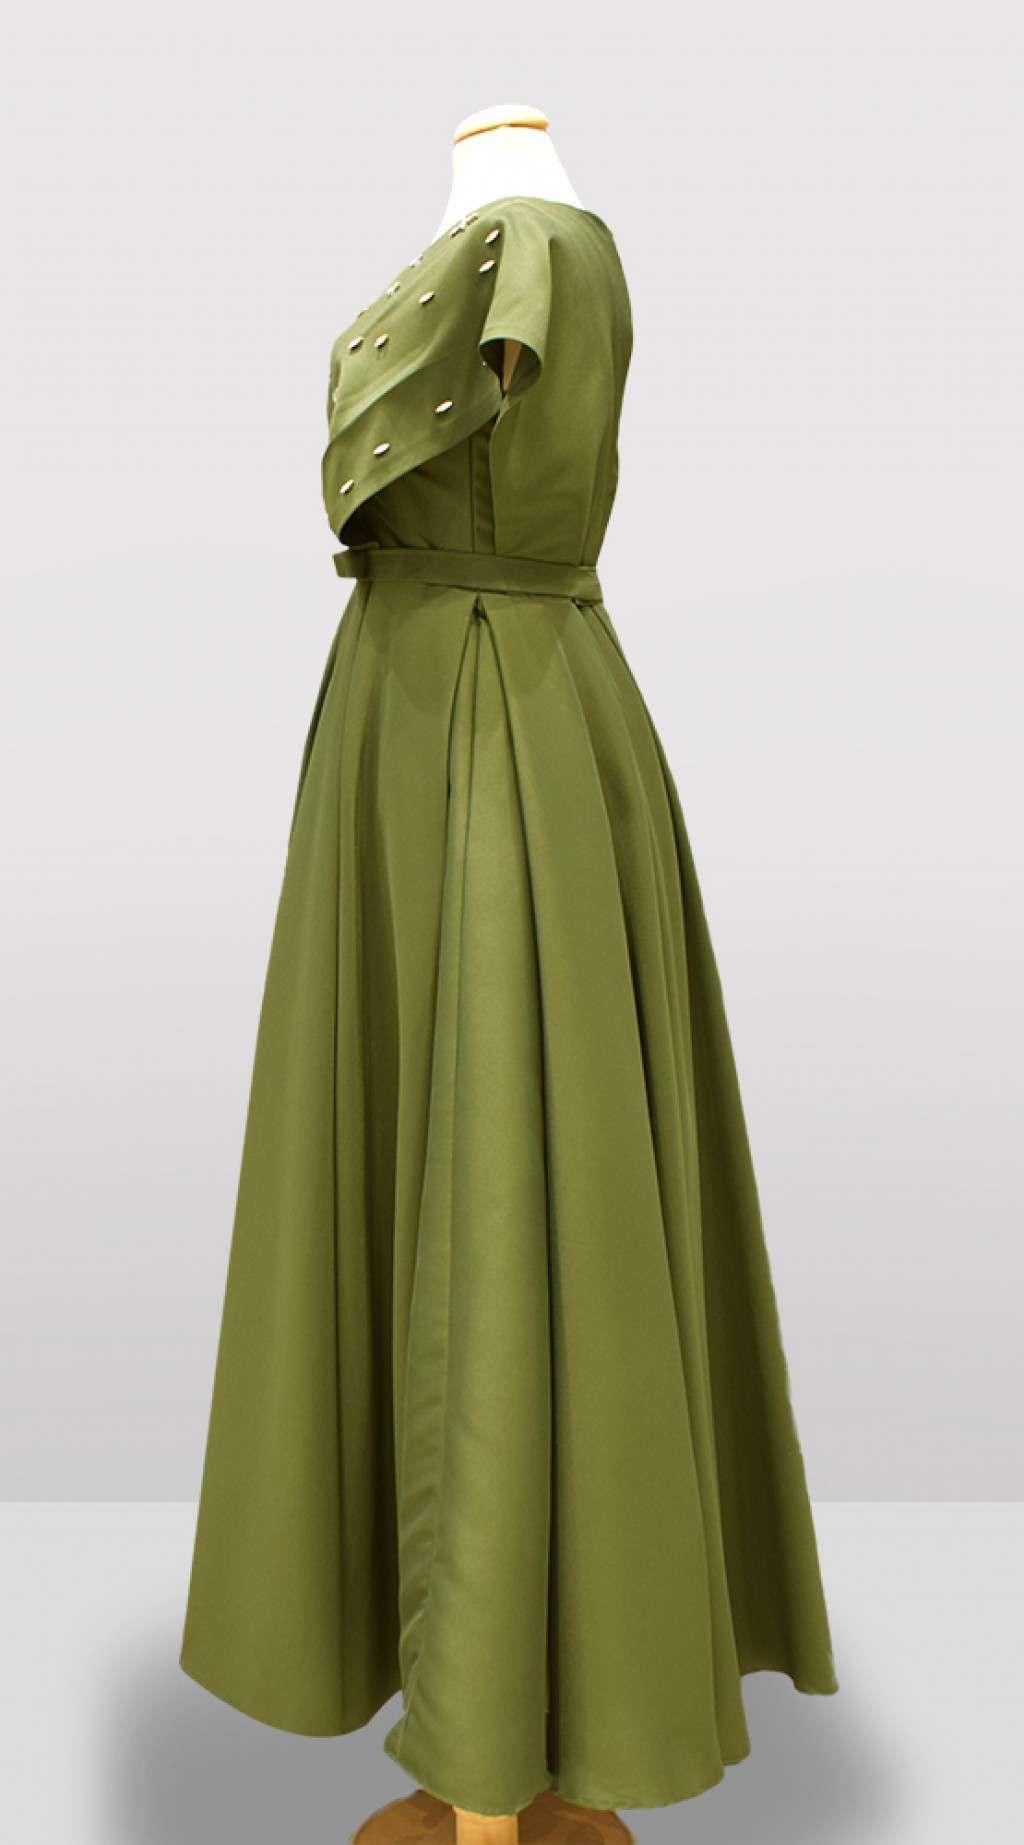 اخضر روماني